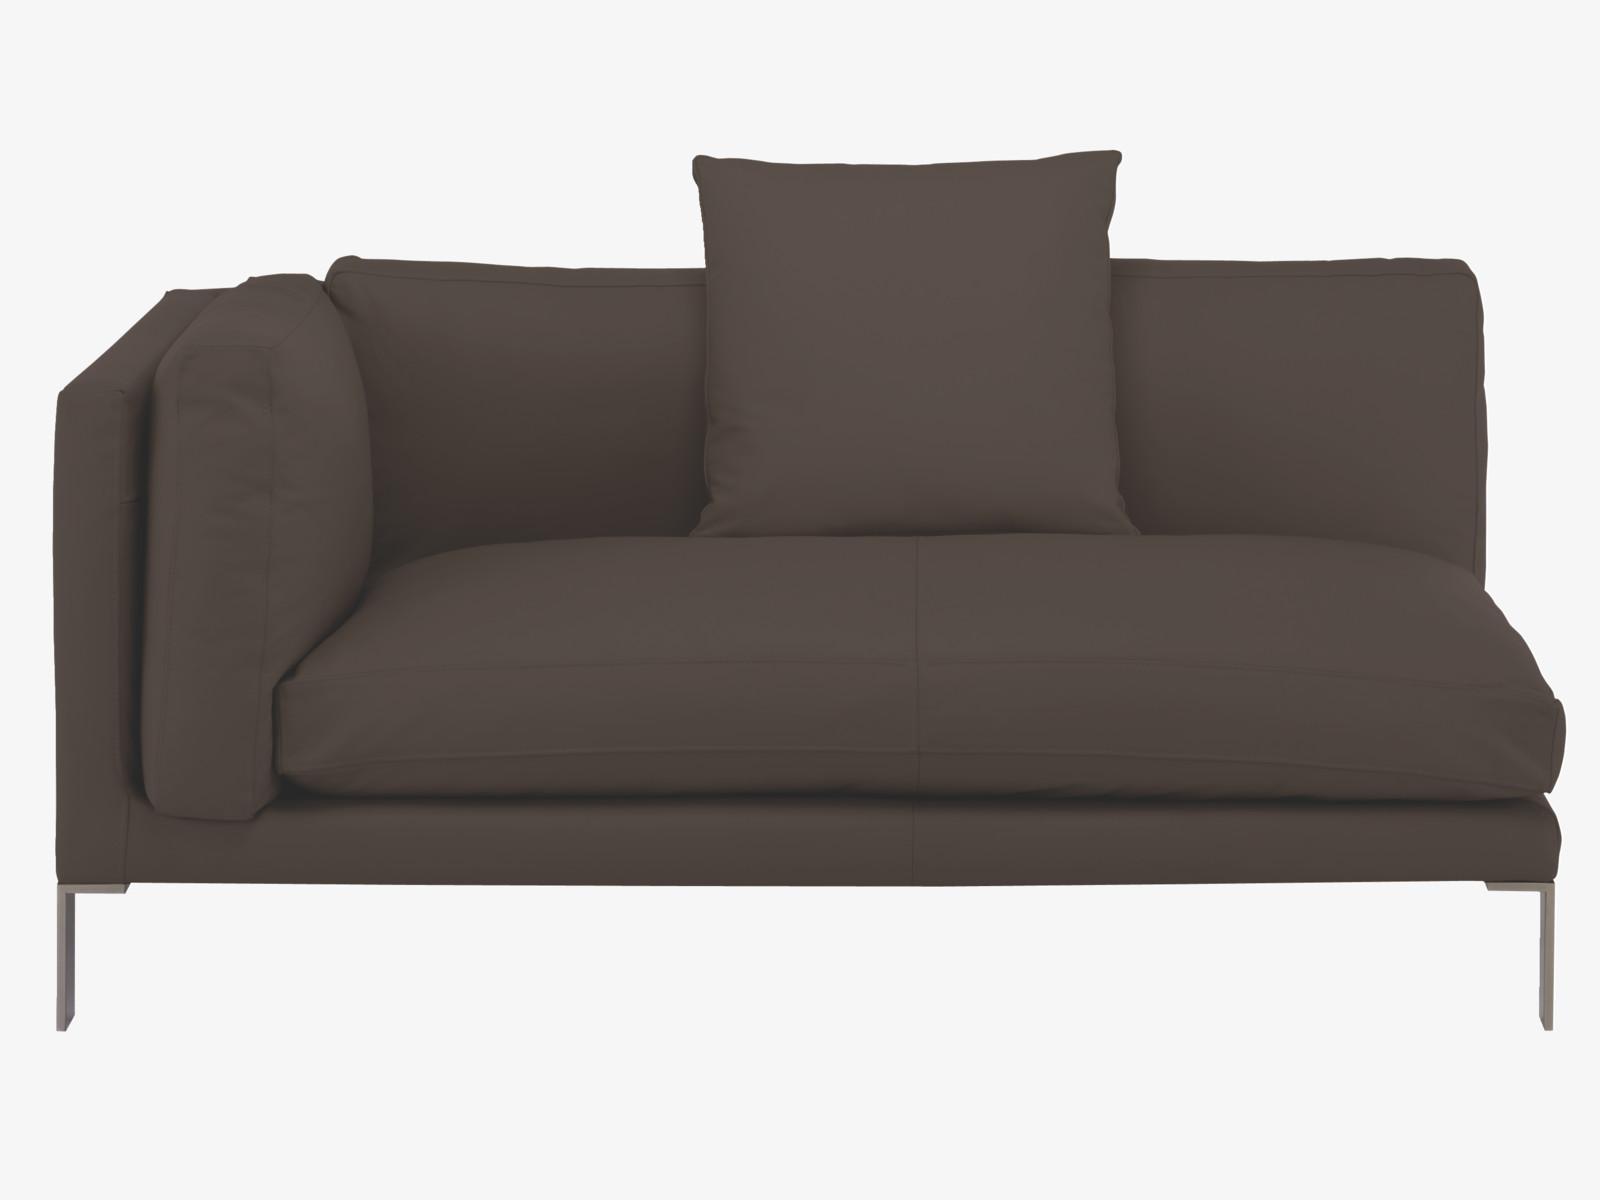 10 Best Contemporary Sofas For Modern Homes Fresh Design